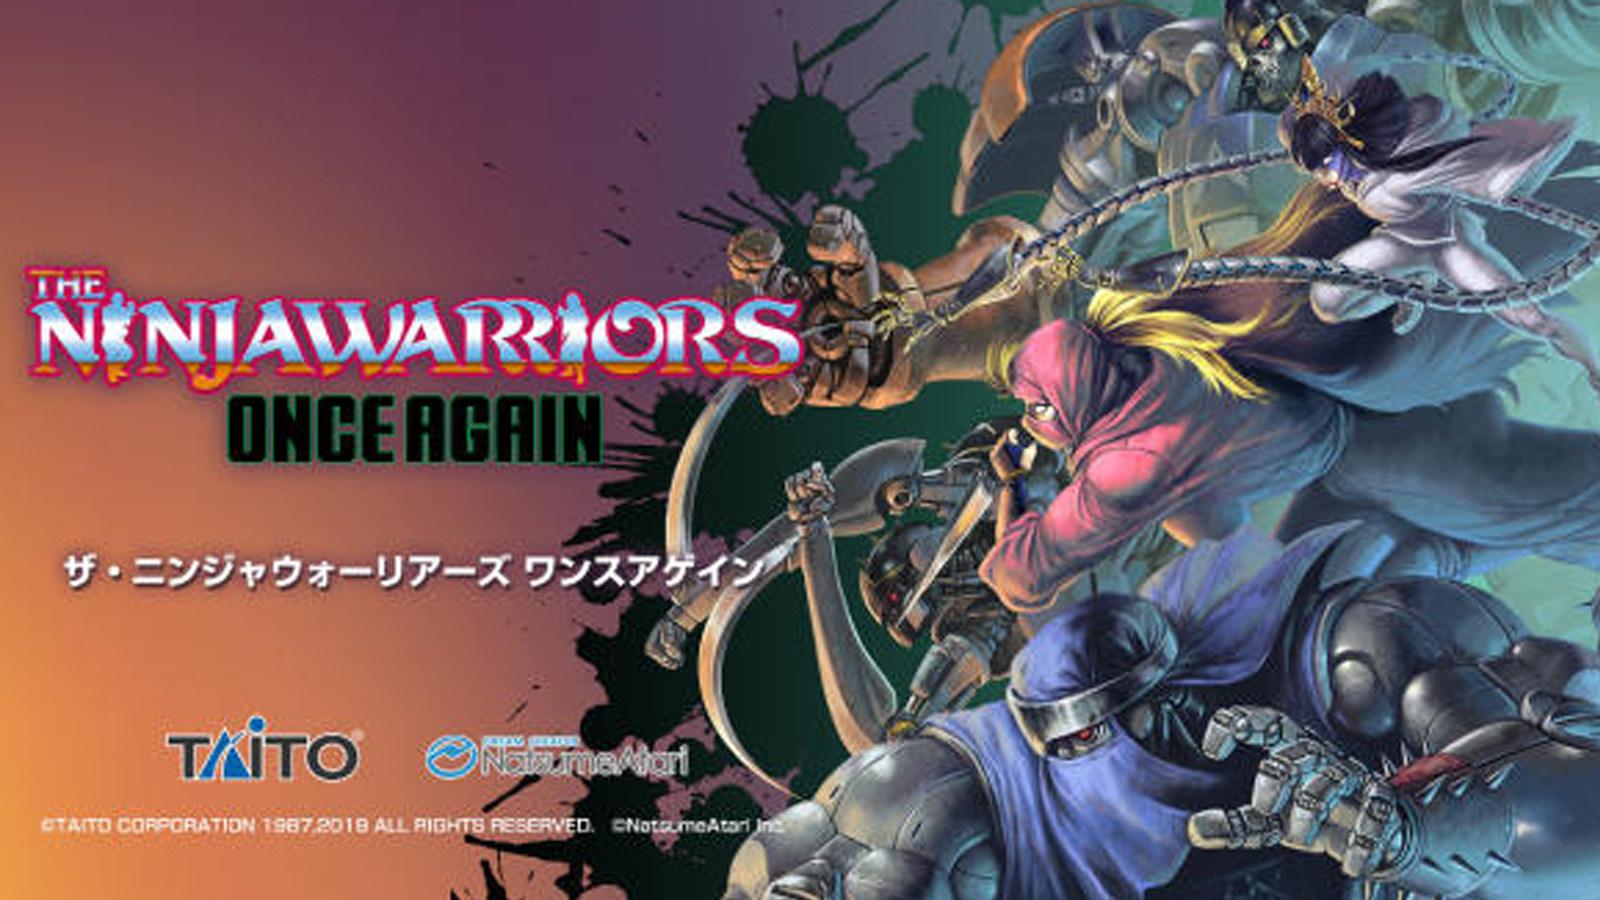 横版卷轴忍者游戏《The Ninja Warriors: Once Again》将在7月25日登陆PS4和NS平台